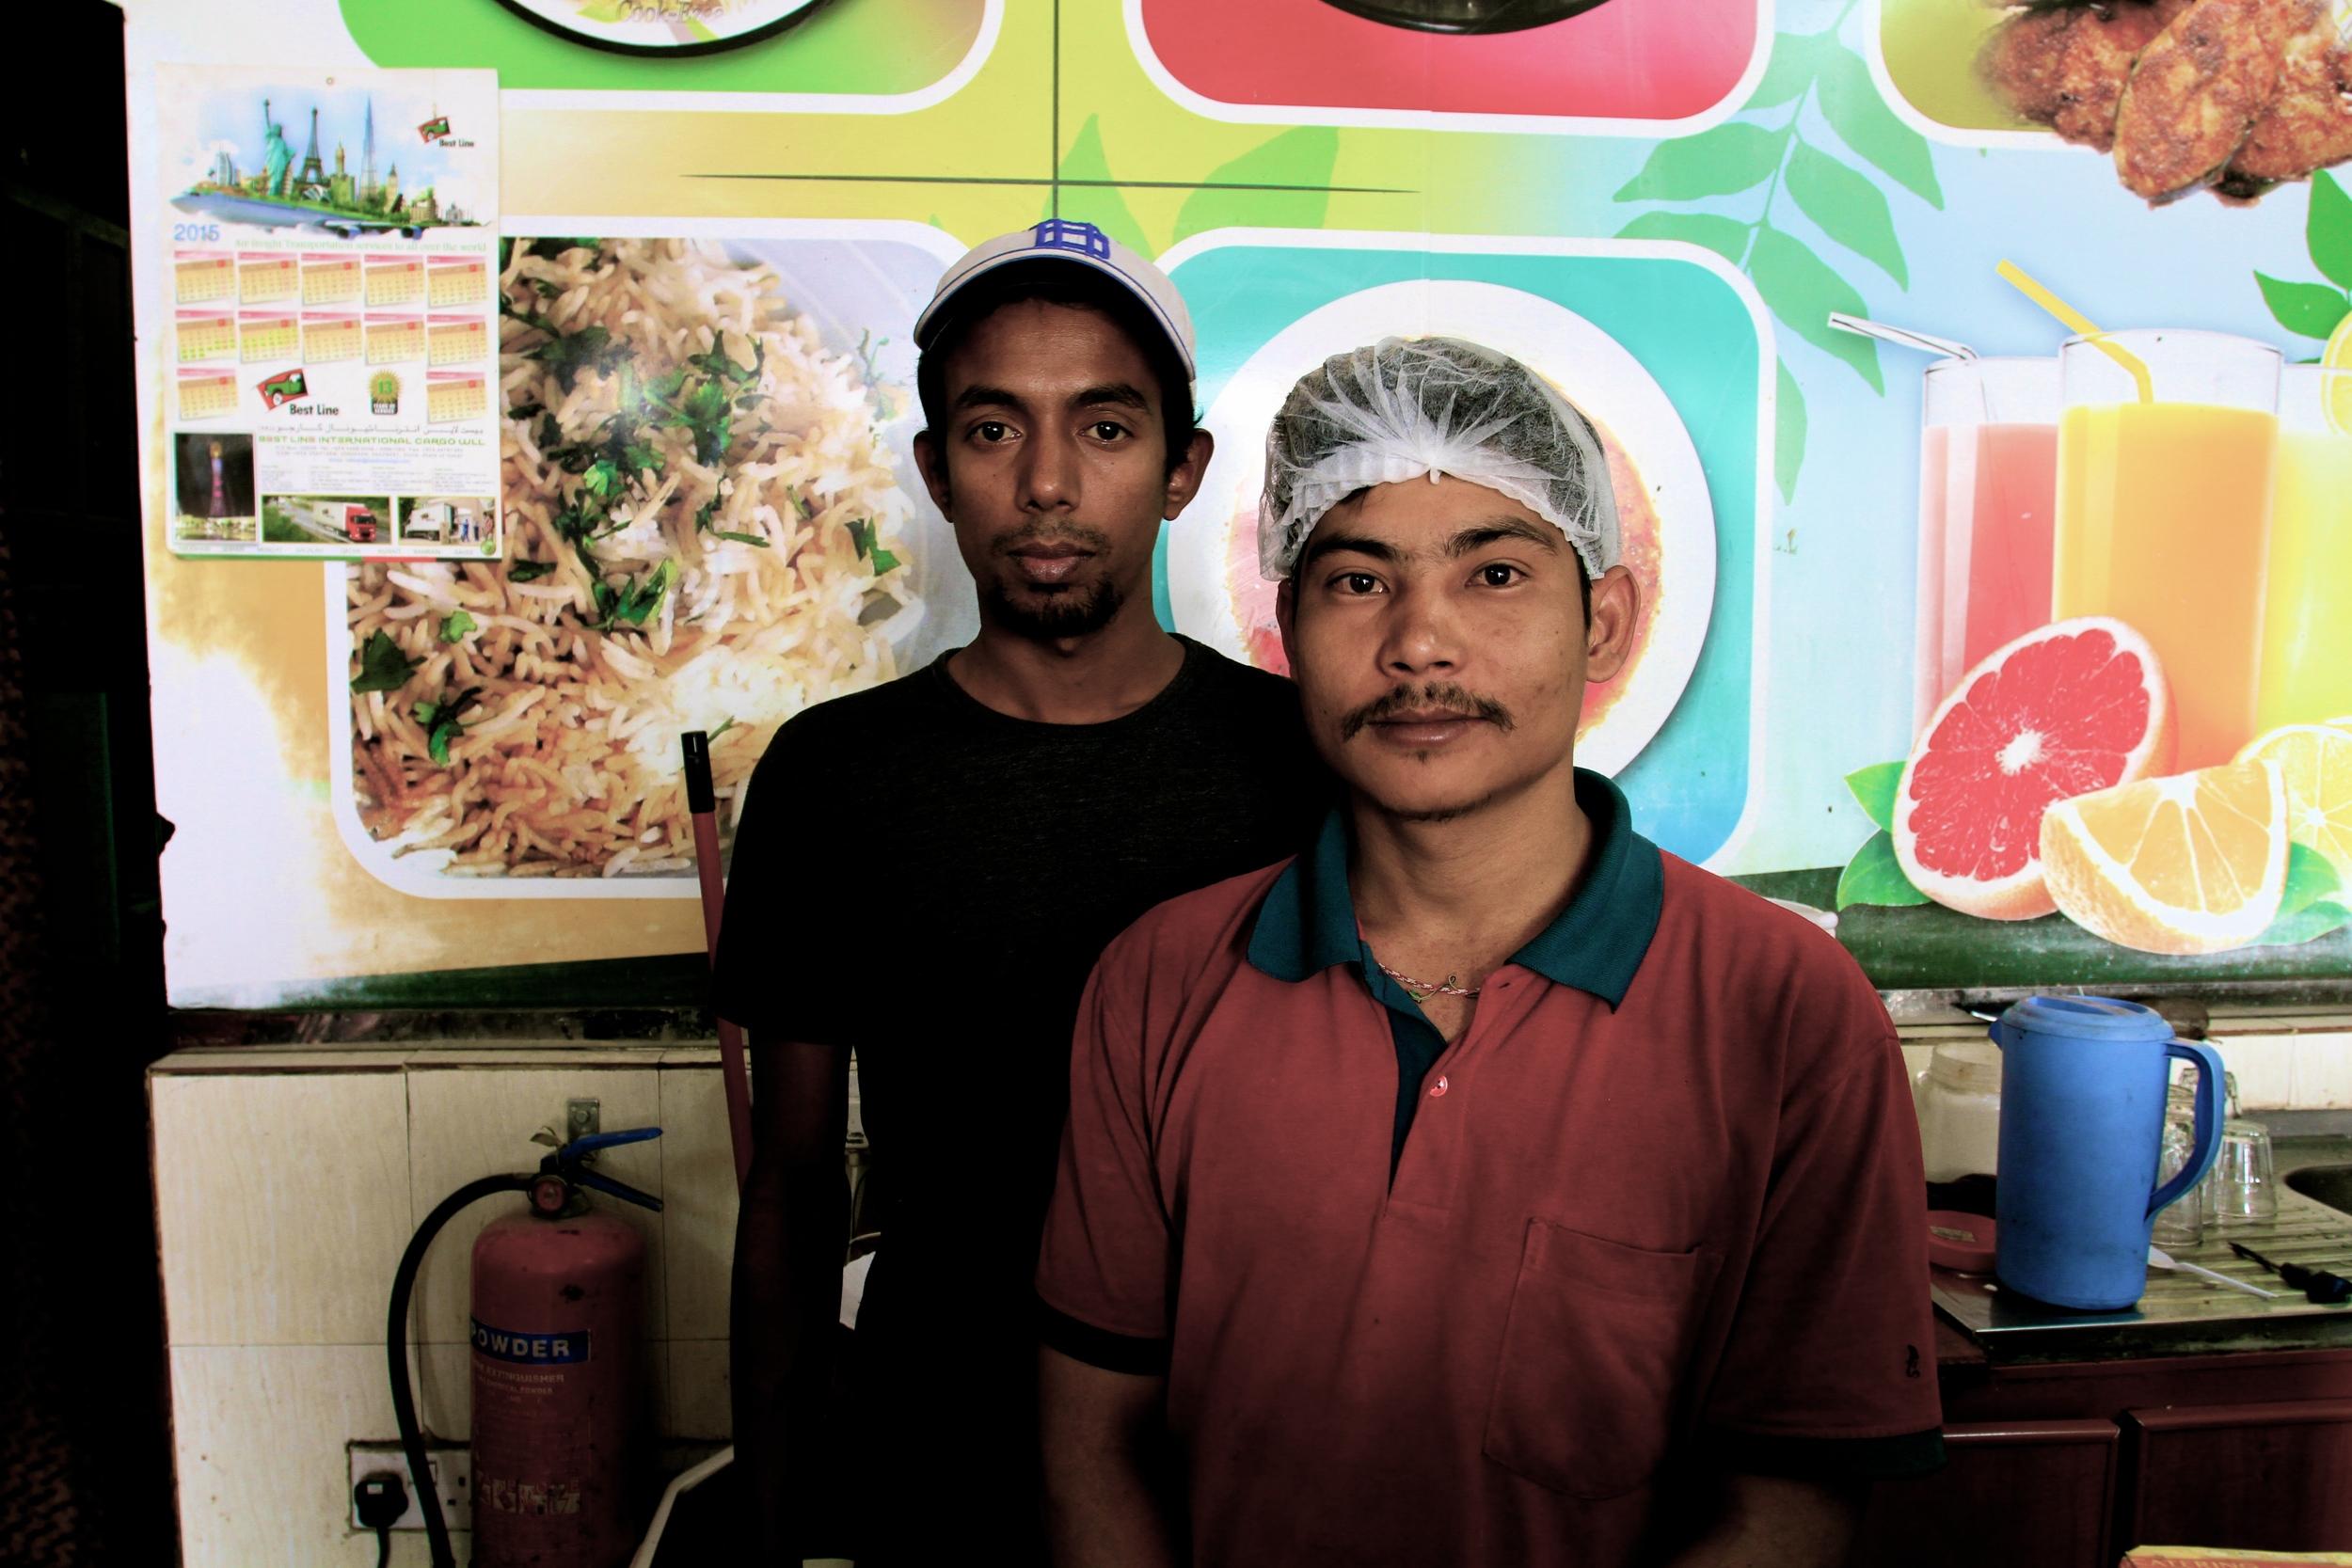 Laheer from Kandy, Sri Lanka and Mohan from Morang, Nepal are among Zaiqa'sstaff members.